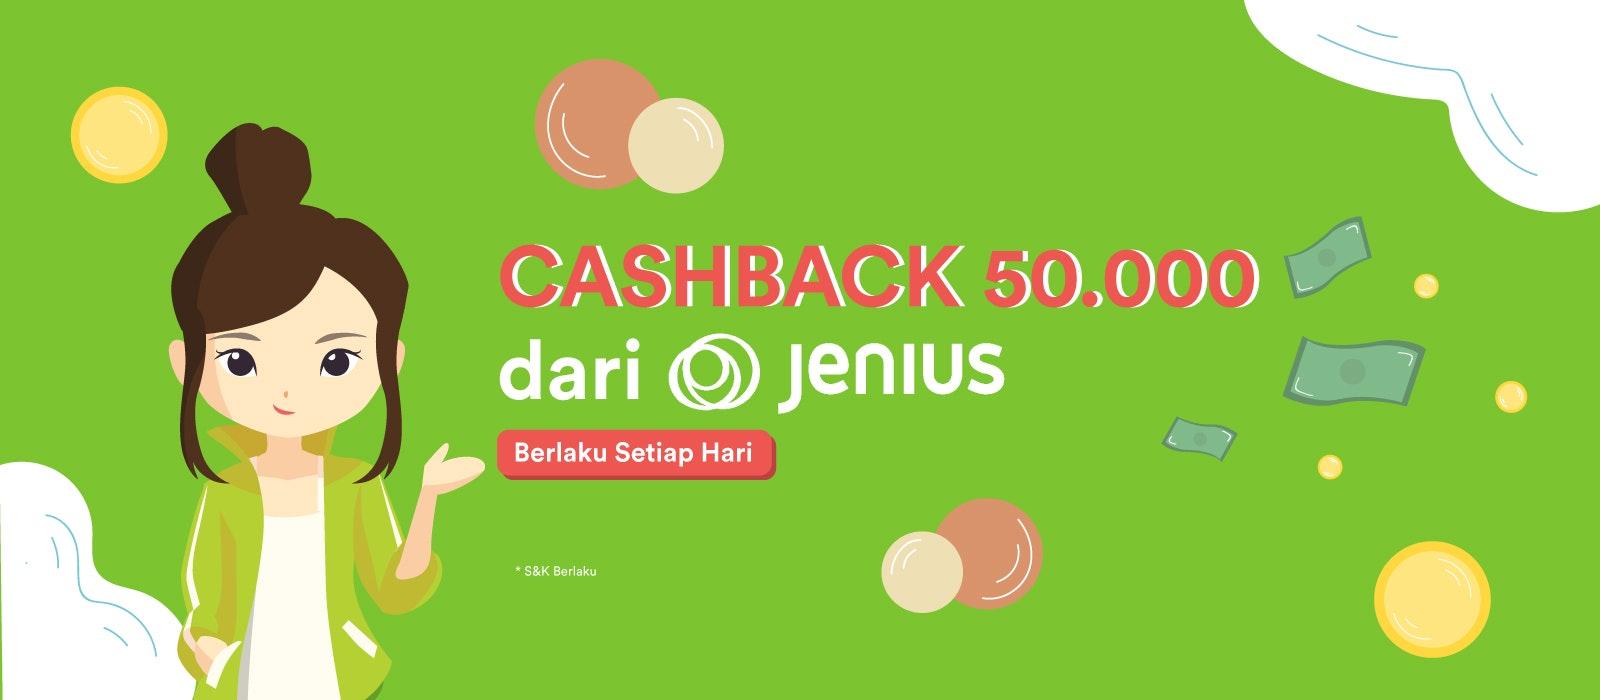 Belanja dengan Jenius Pay Dapat Cashback Rp 50.000!